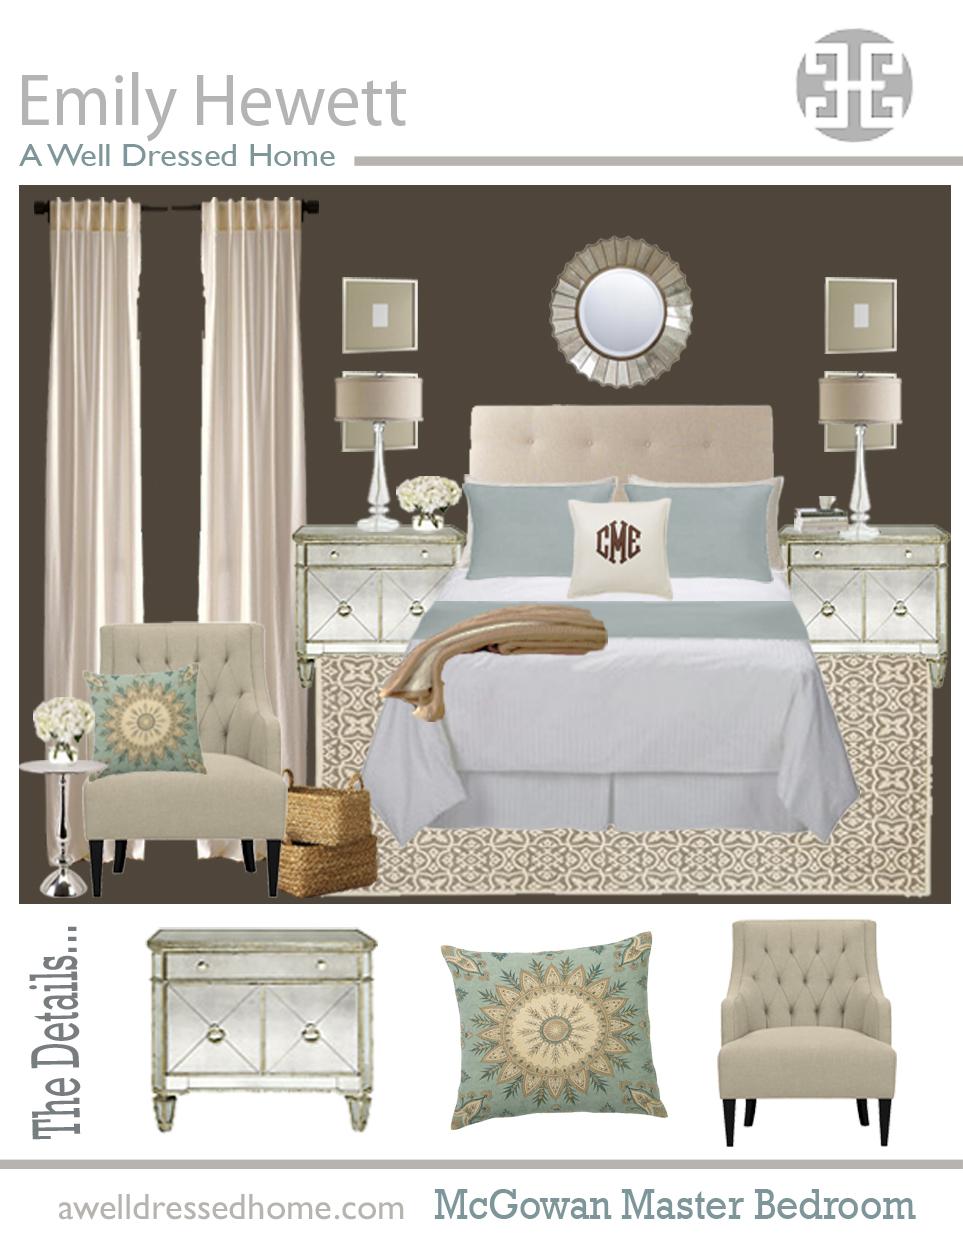 McGowan Master Bedroom